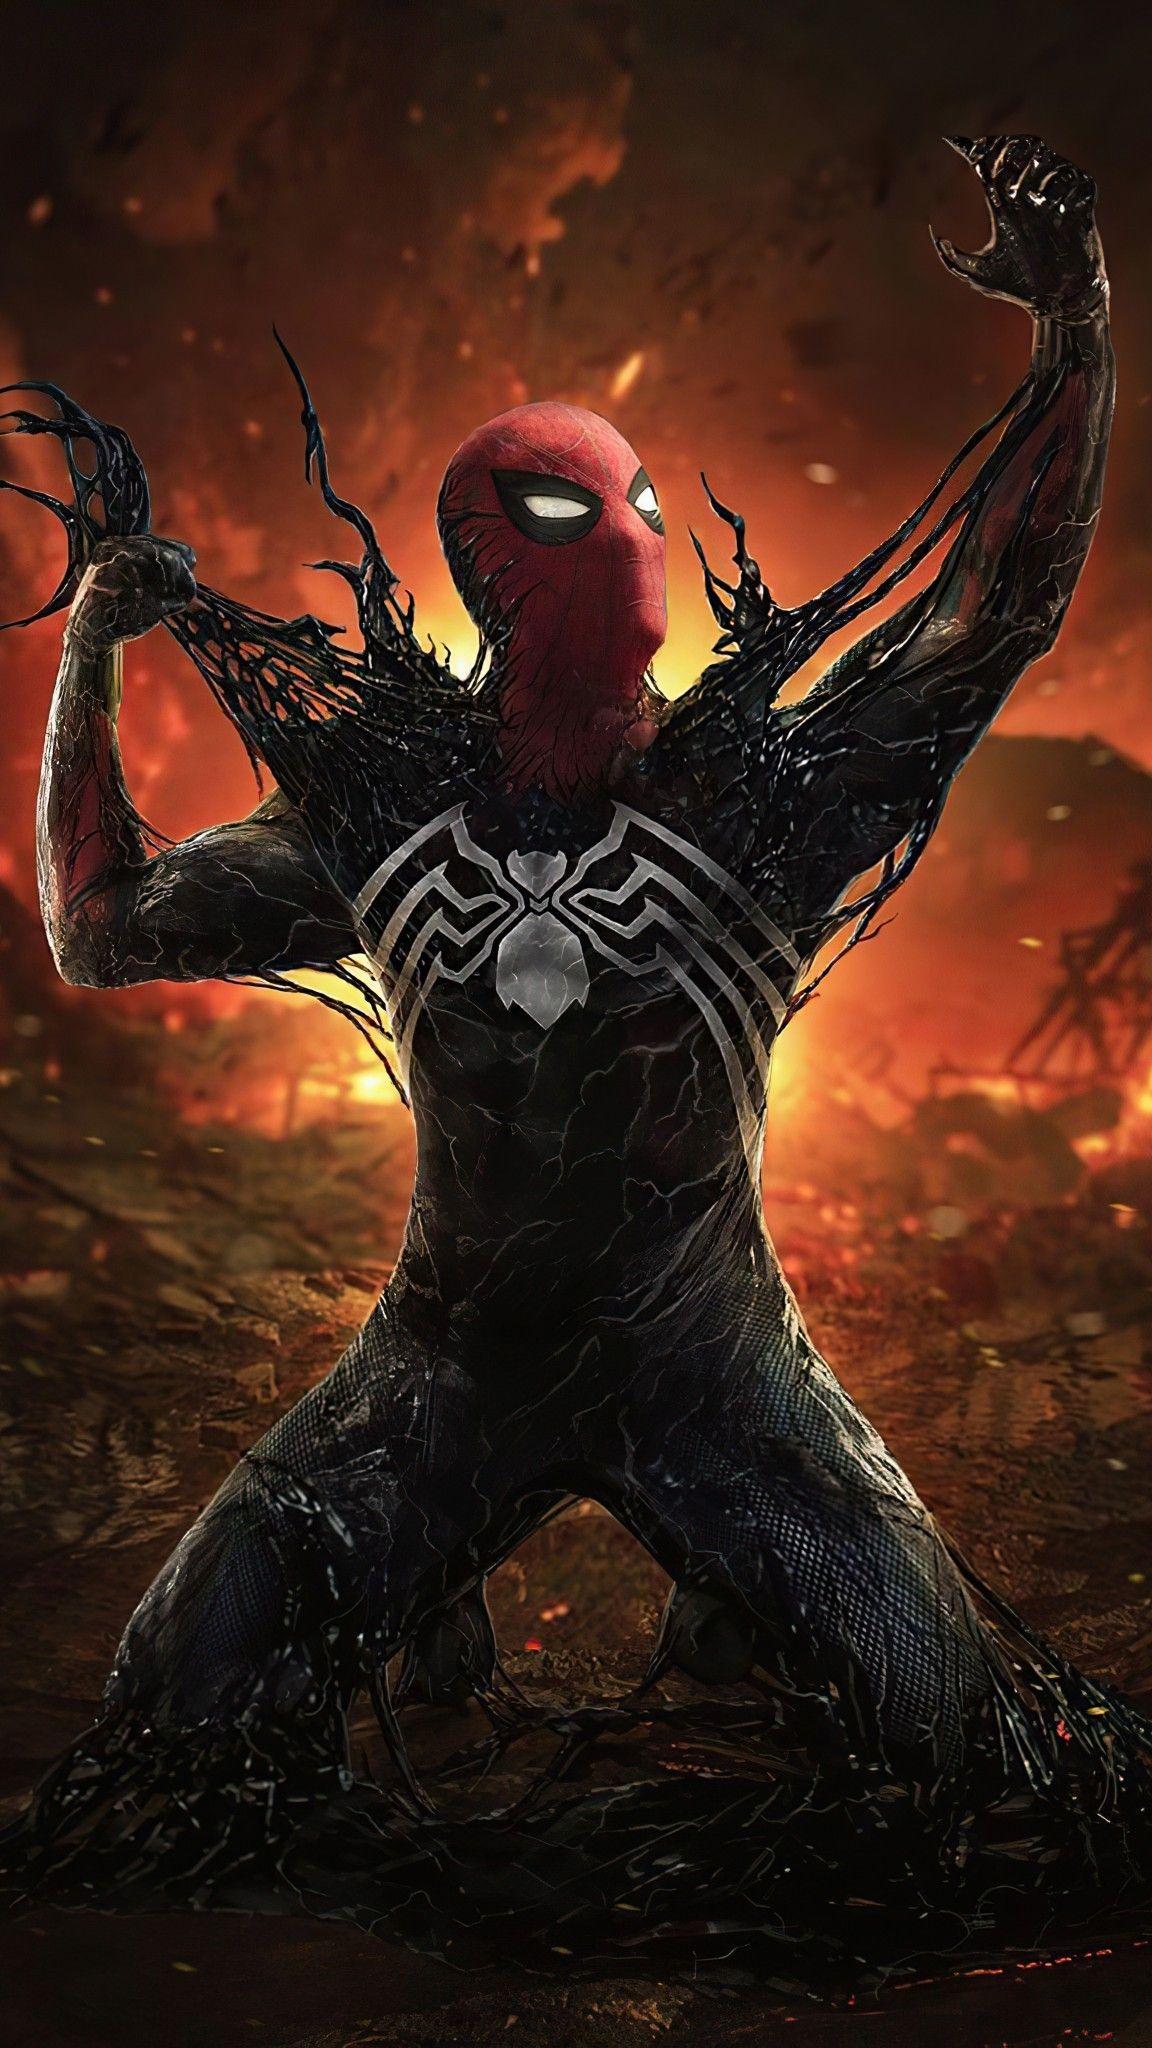 Spider Man Vs Venom Symbiote Spiderman Spiderman Art Venom Spiderman